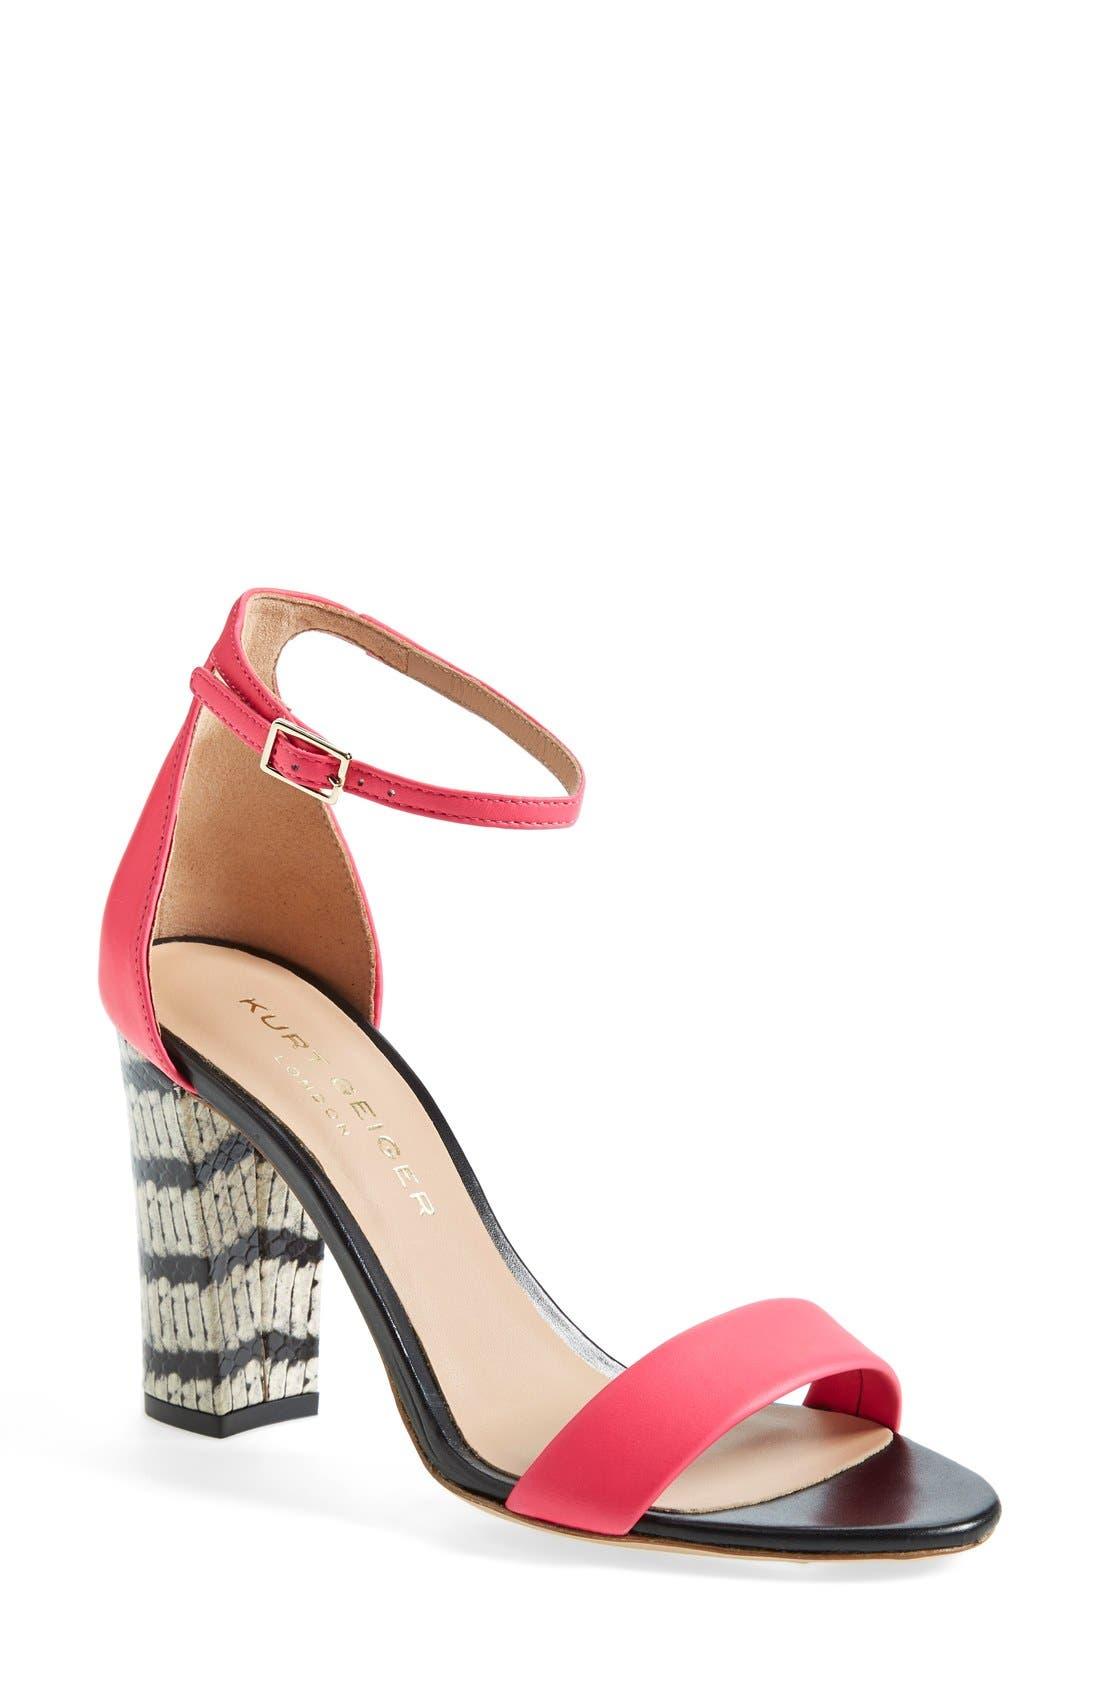 Alternate Image 1 Selected - Kurt Geiger London 'Isabella' Ankle Strap Sandal (Women)